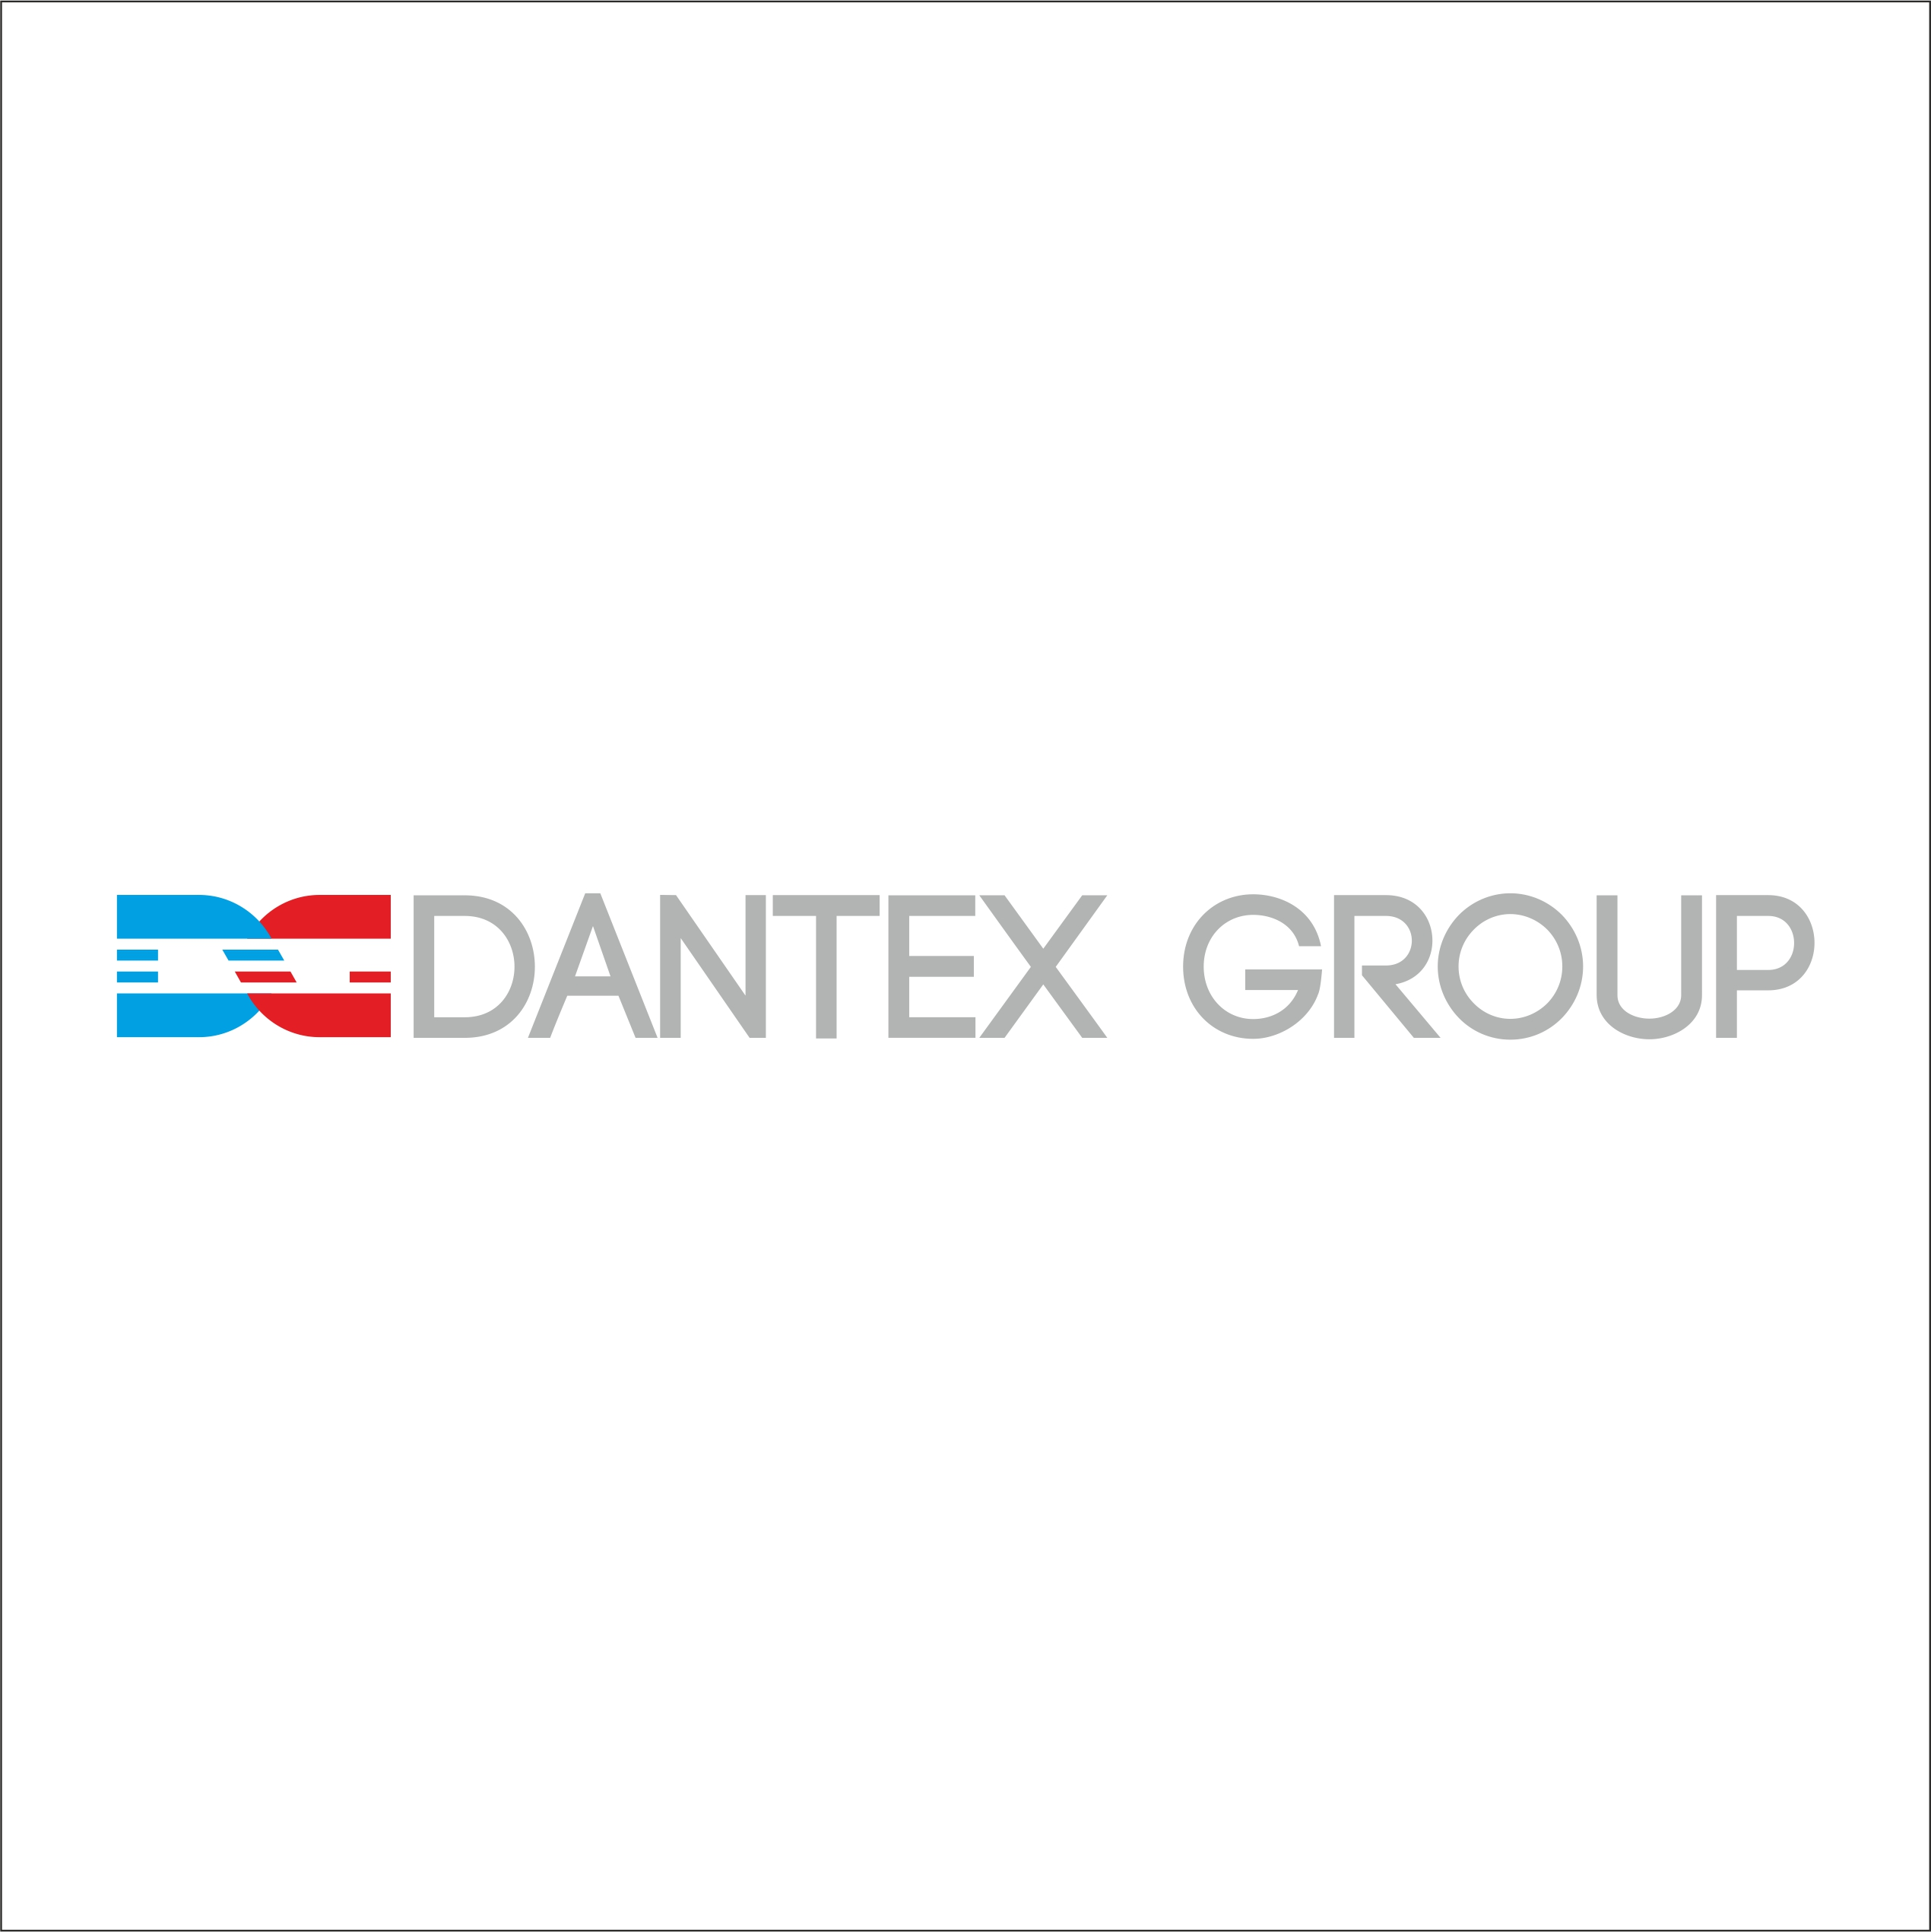 Конкурс на разработку логотипа для компании Dantex Group  фото f_0775c07538e43c4a.jpg